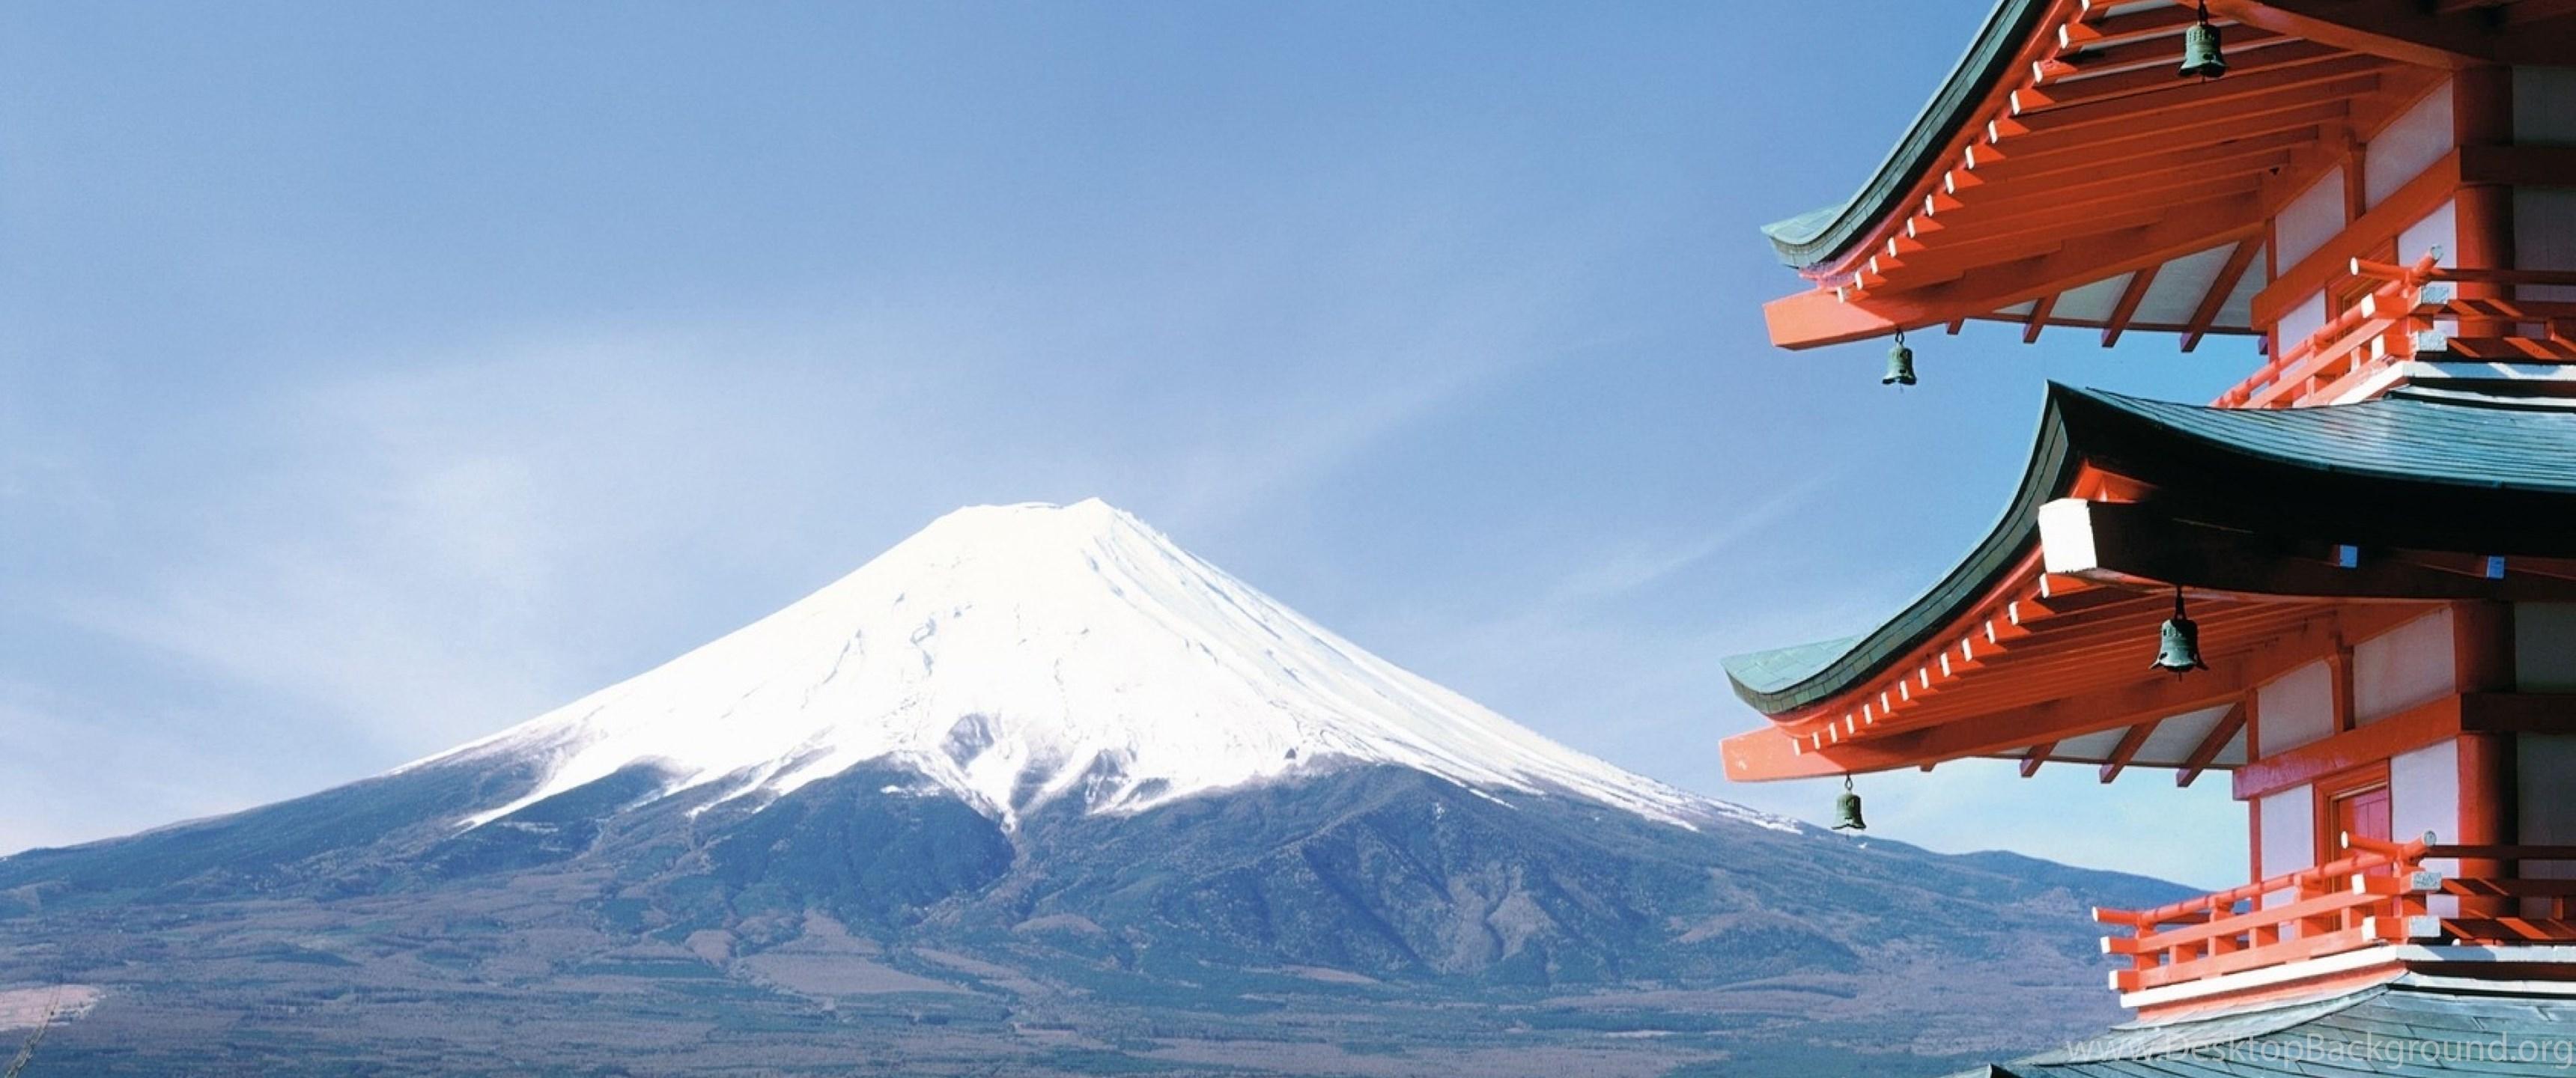 Download Wallpapers 3840x2160 Fuji Japan City Sakura 4k Ultra Hd Desktop Background